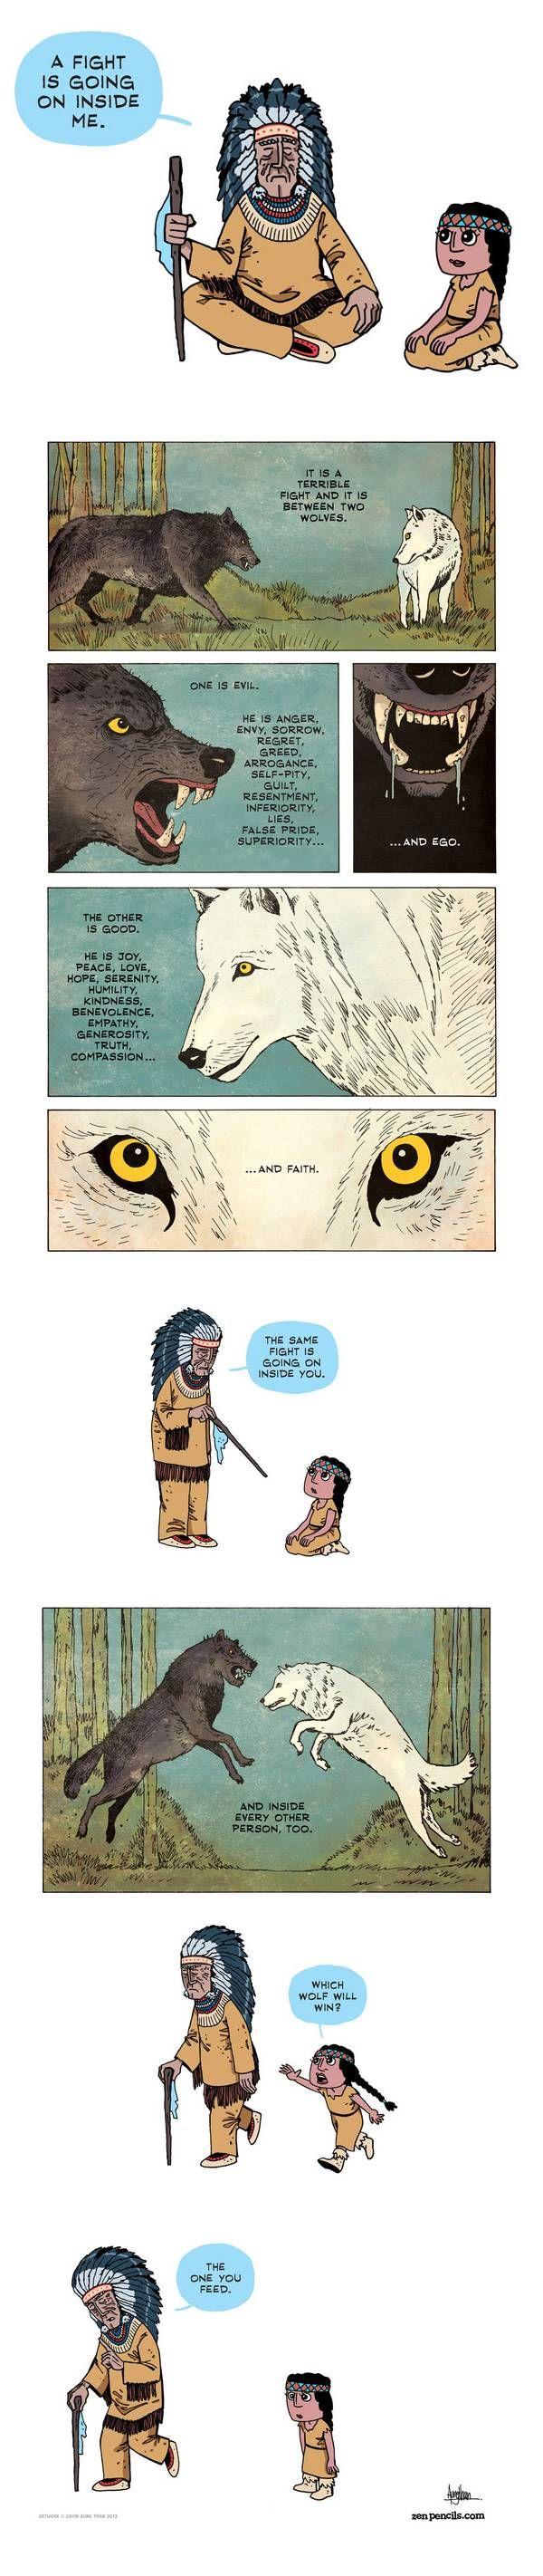 American Indian Wisdom